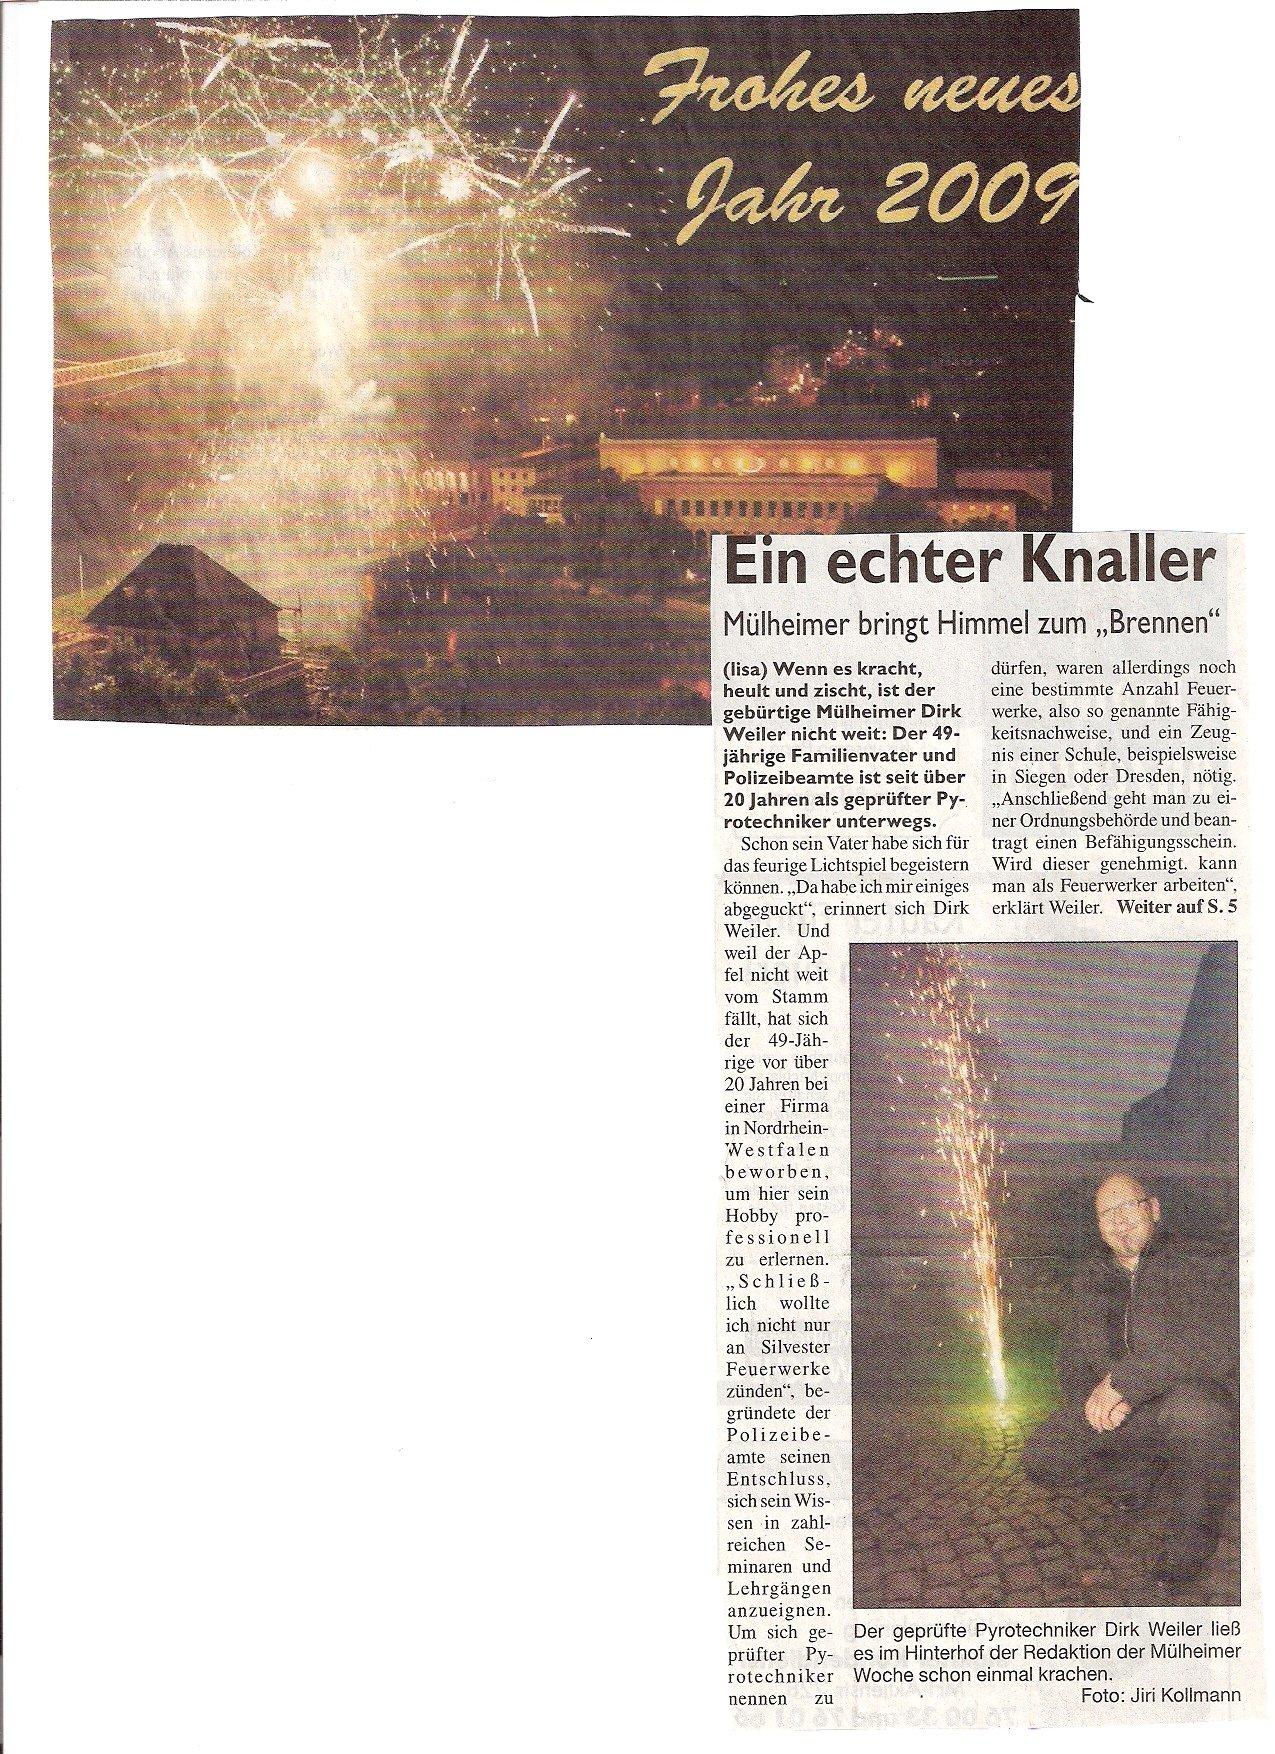 081228-artikel-mulheimer-woche-1